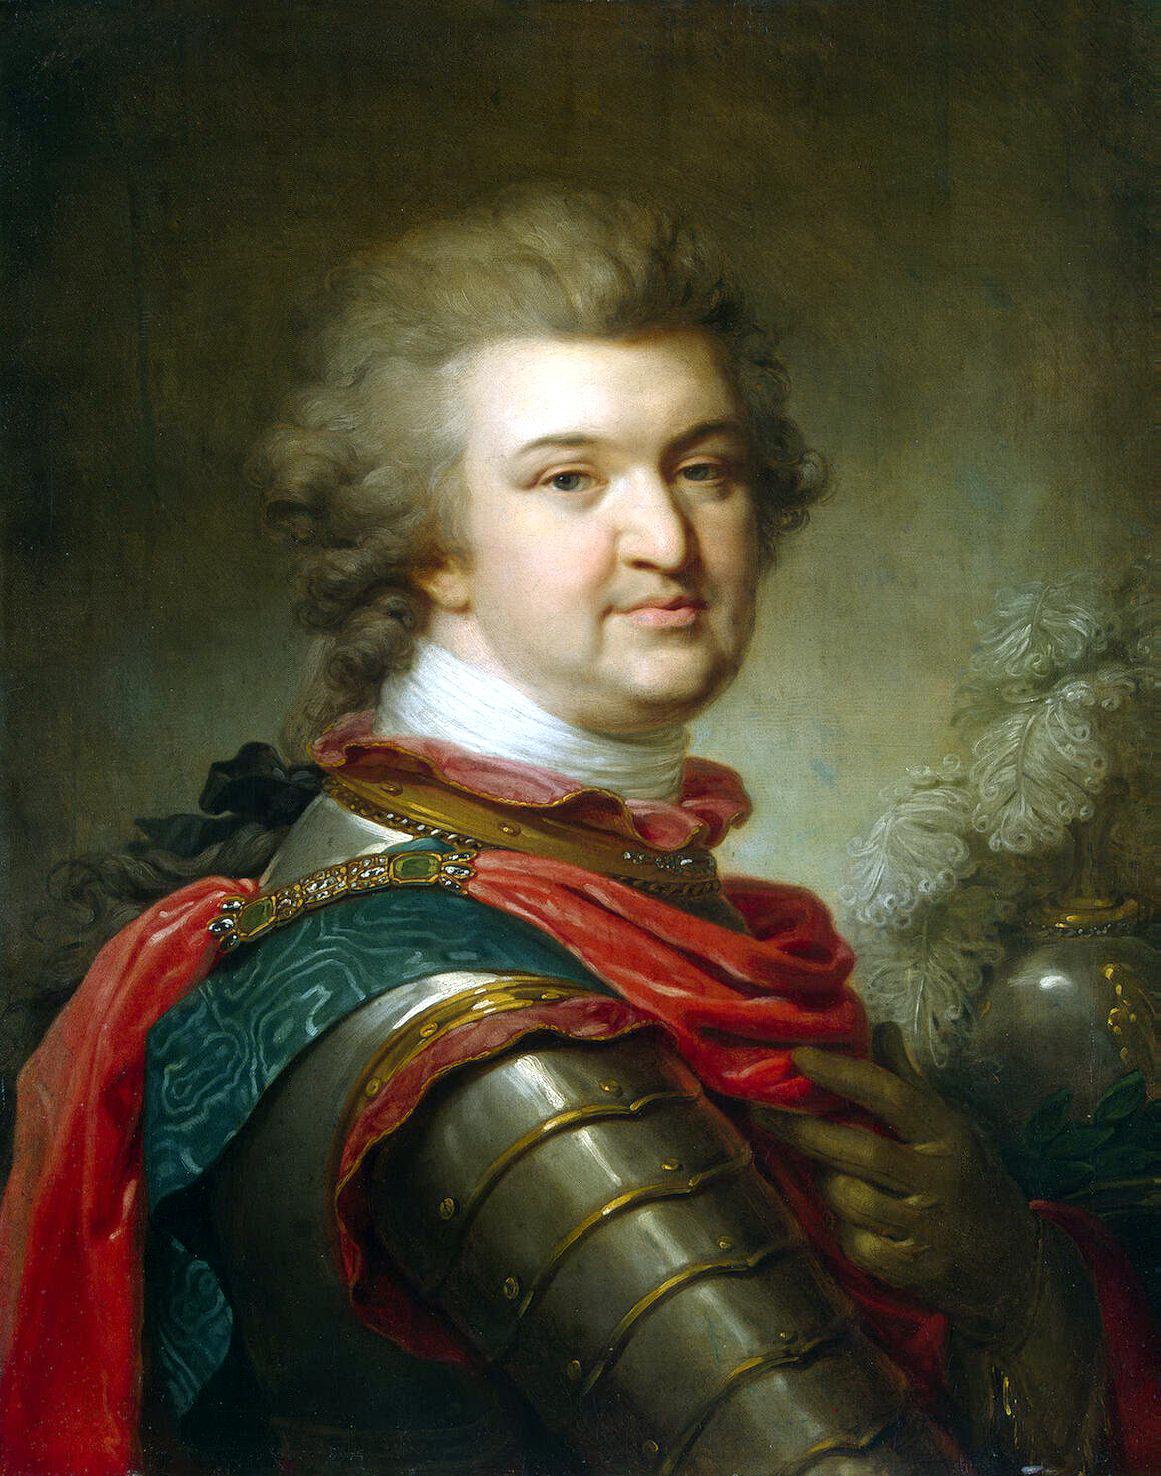 Григорий Потемкин. Источник: https://commons.wikimedia.org/